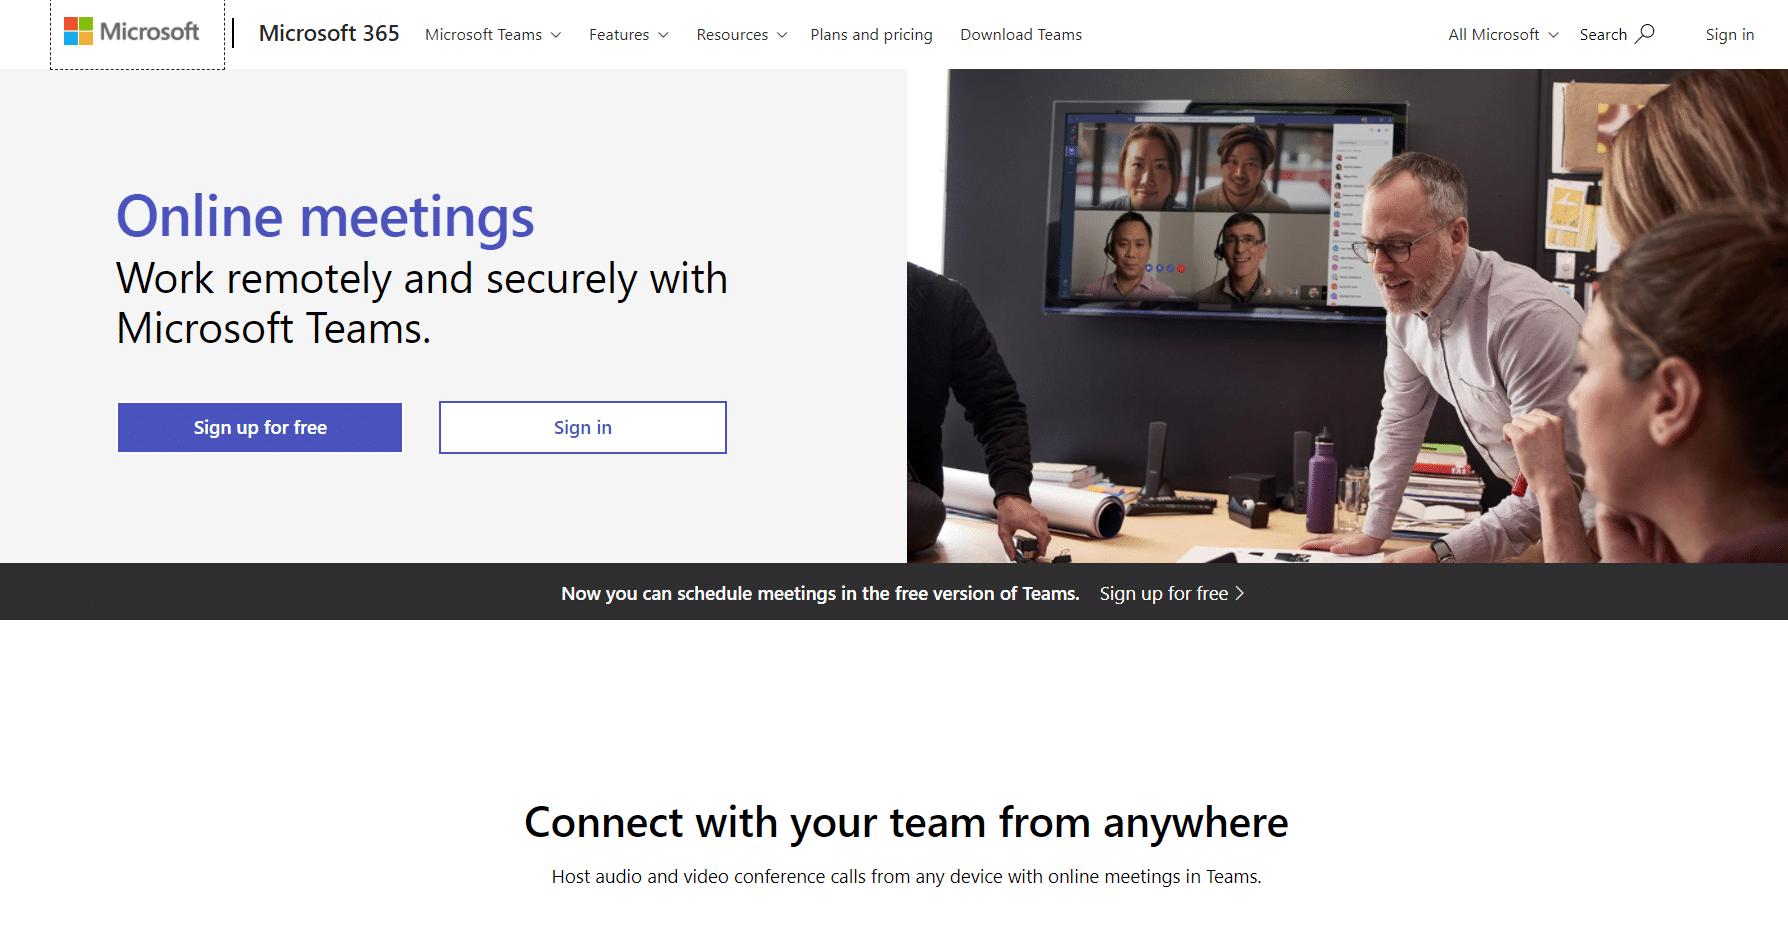 microsoft-team-webinar-software-and-service